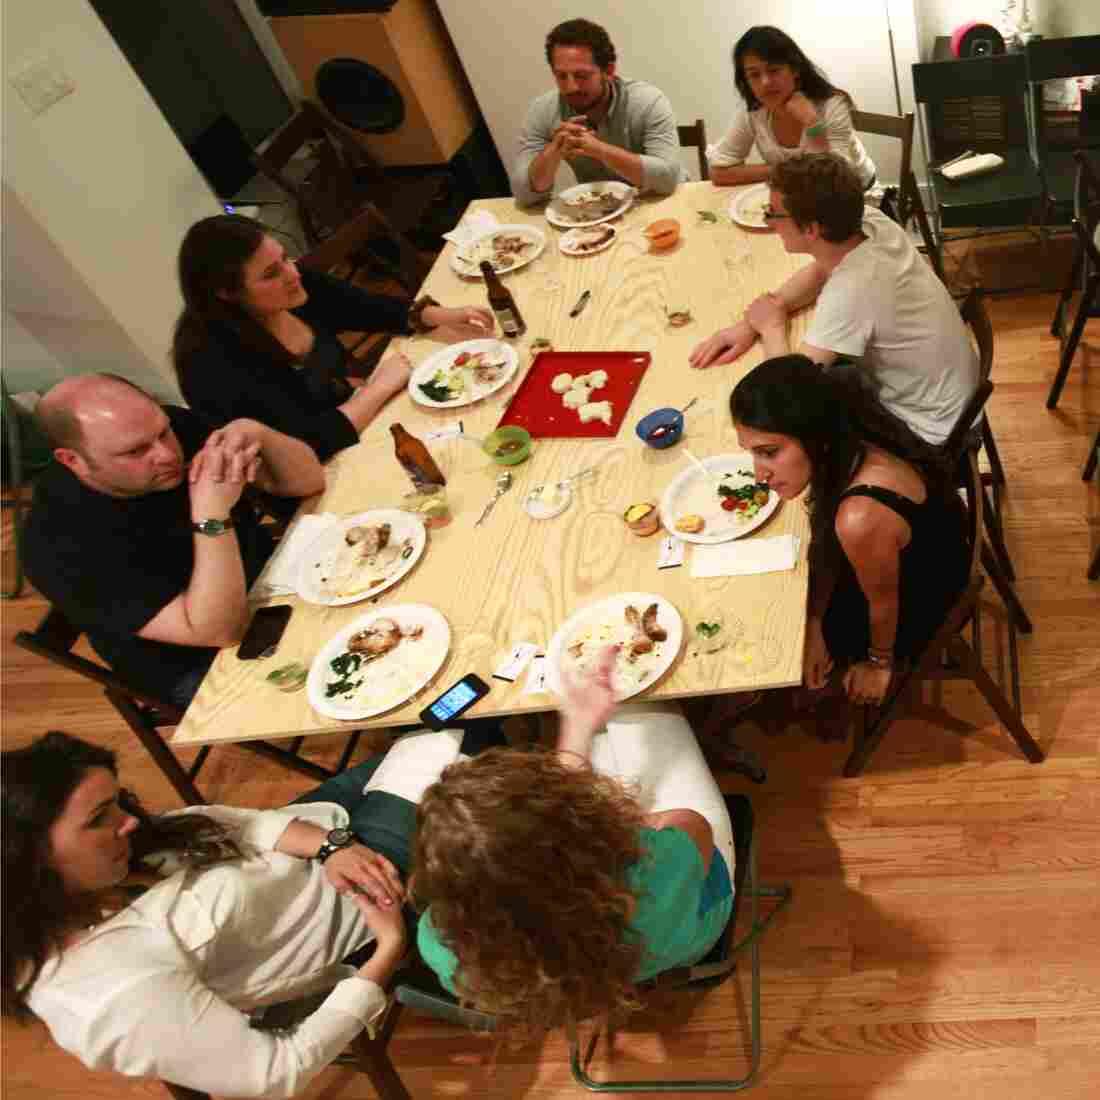 Matching Diners To Chefs, Startups Hatch Underground Supper Clubs